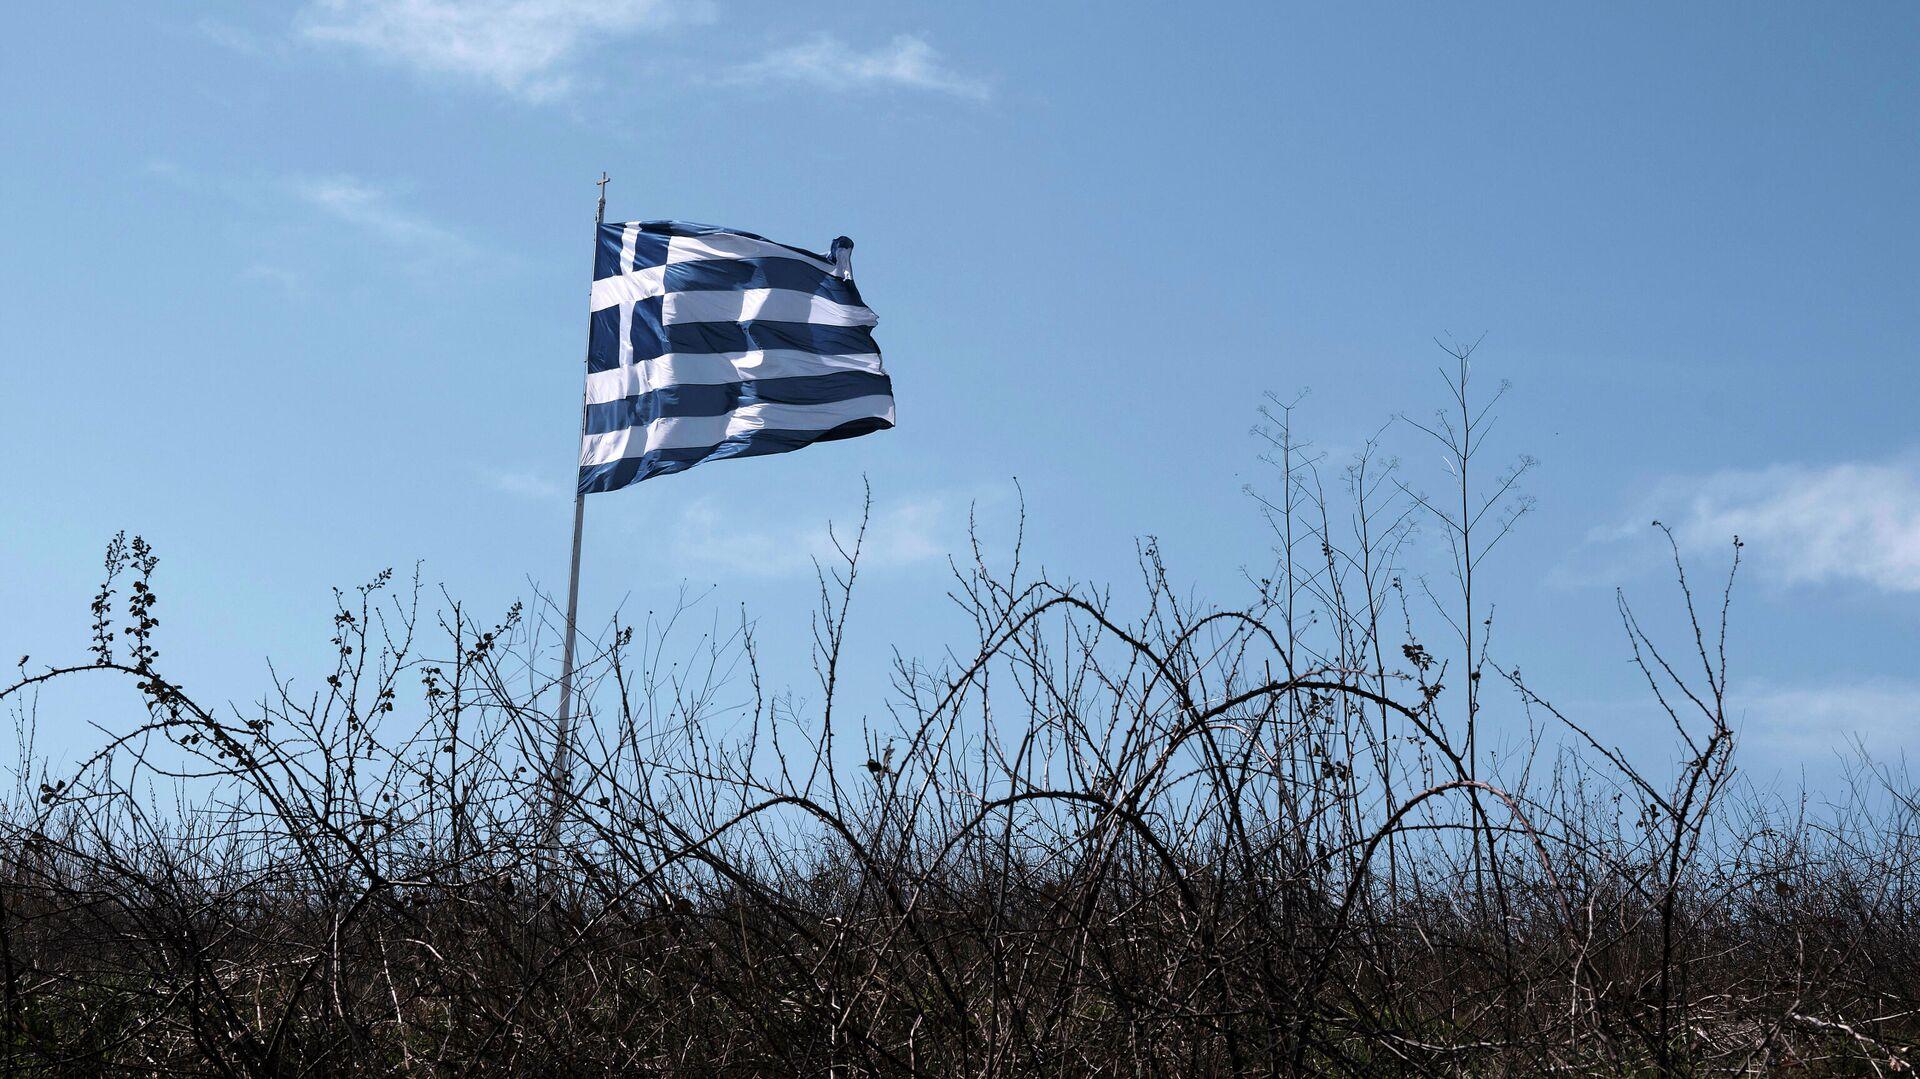 Флаг Греции на турецко-греческой границе - РИА Новости, 1920, 23.09.2020